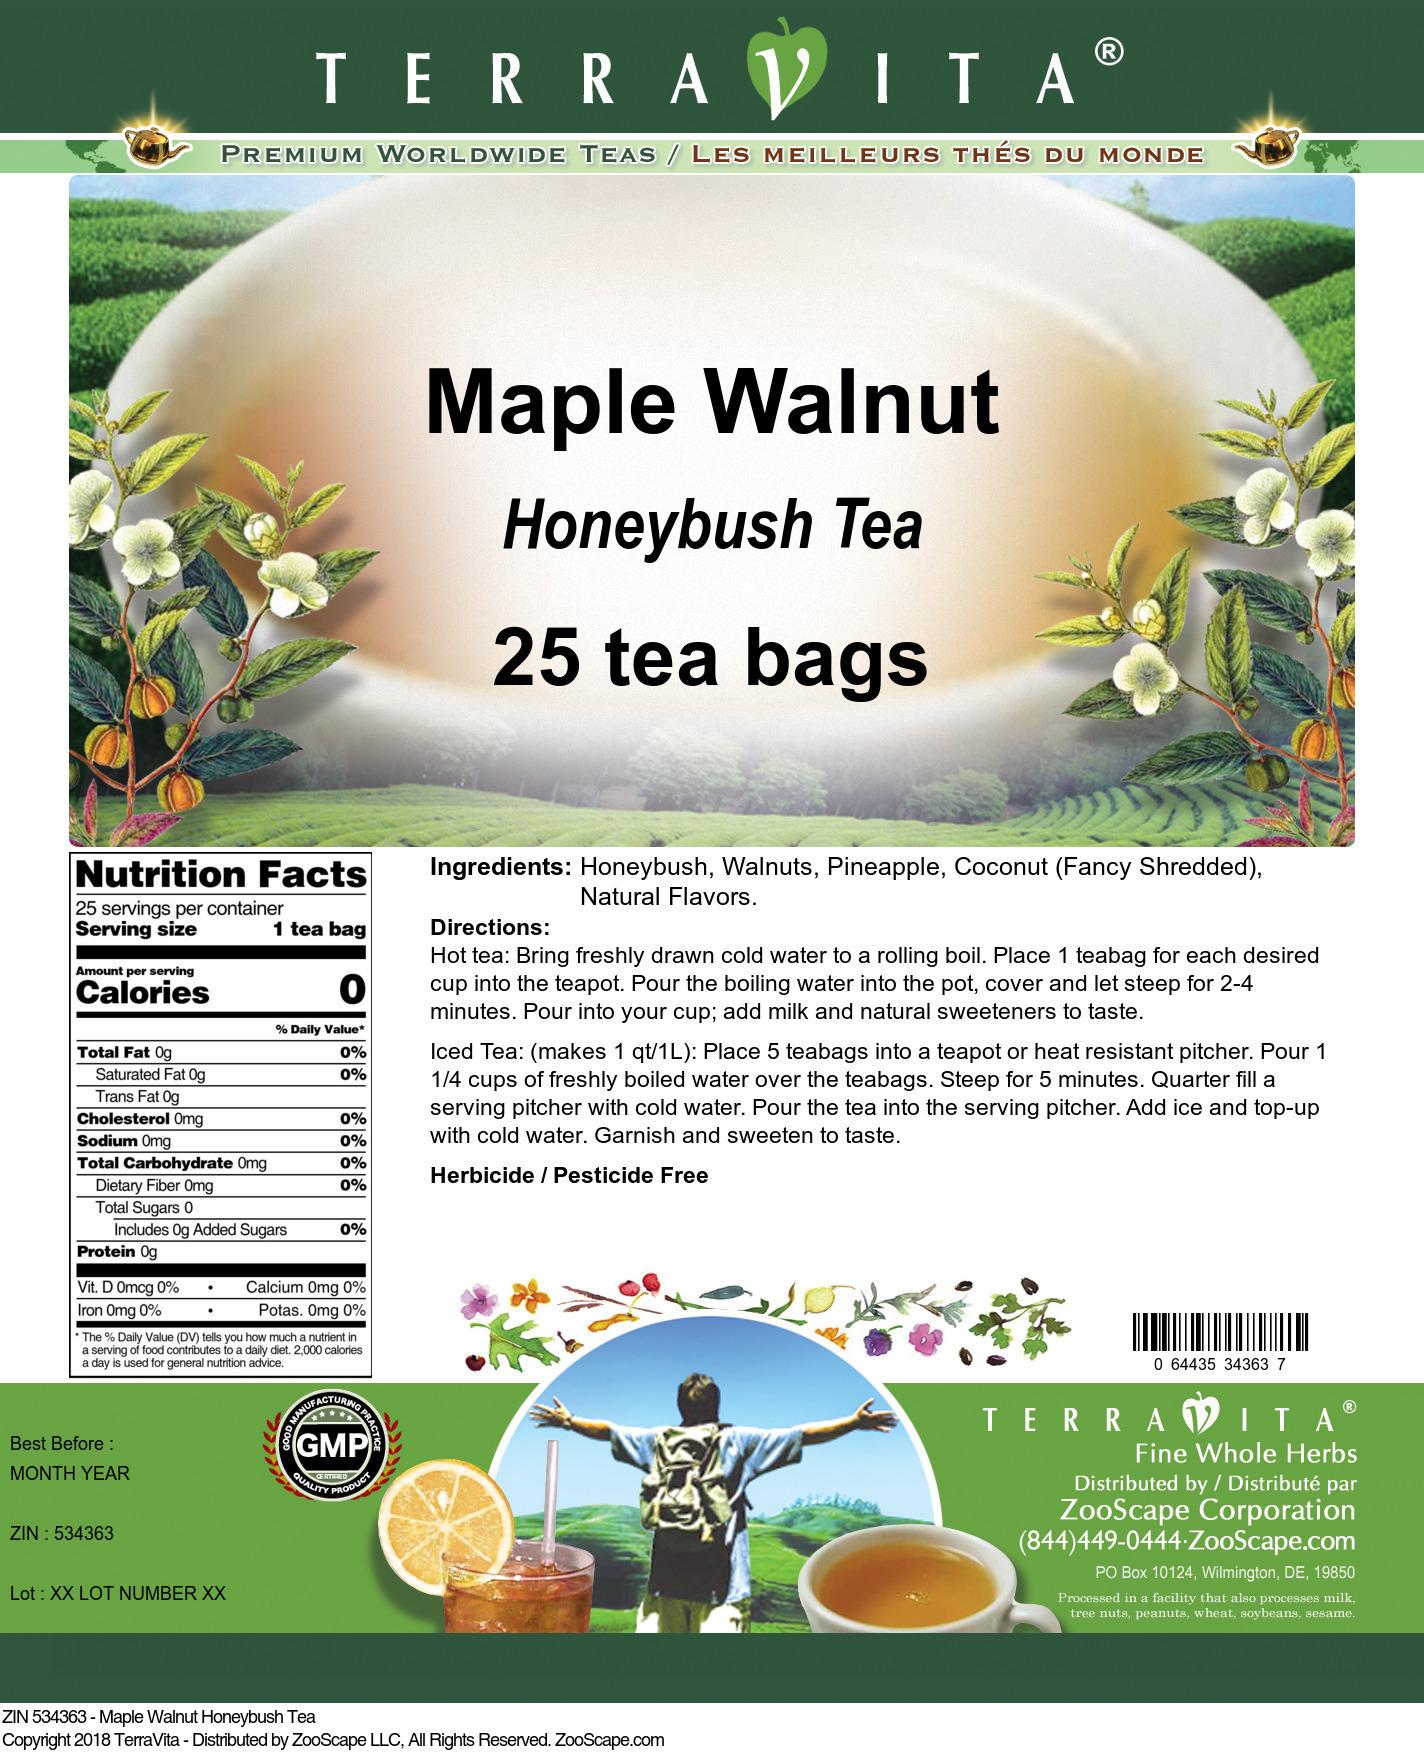 Maple Walnut Honeybush Tea